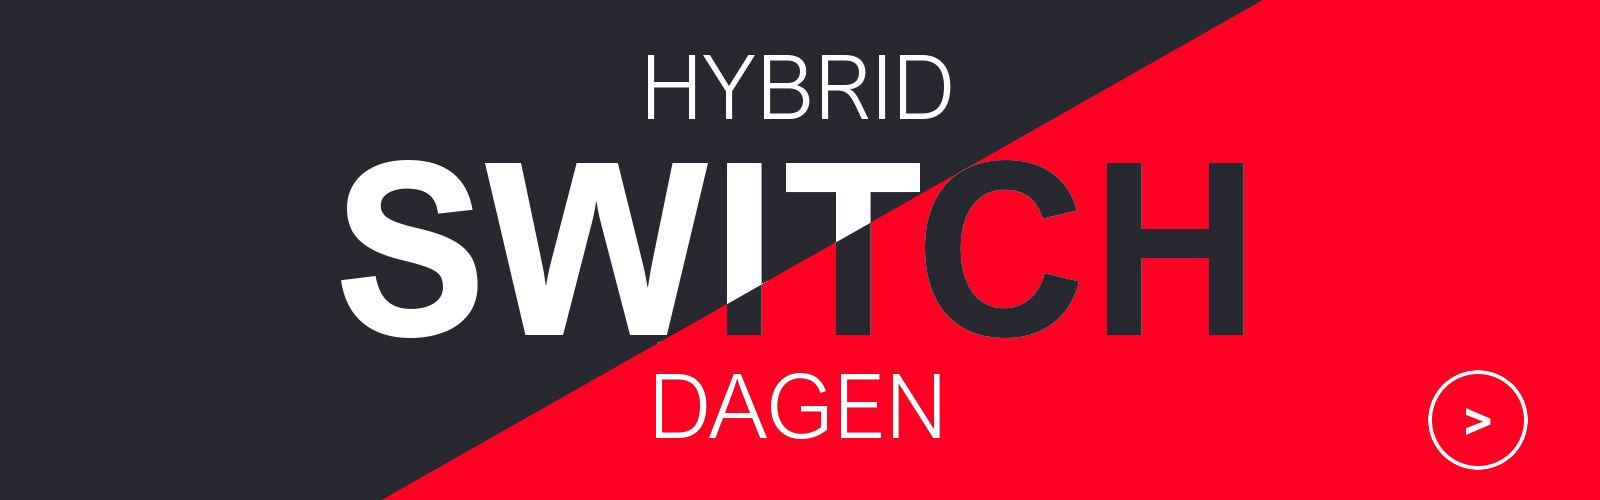 Mengelers-Automotive-Hybride-Switch-Dagen